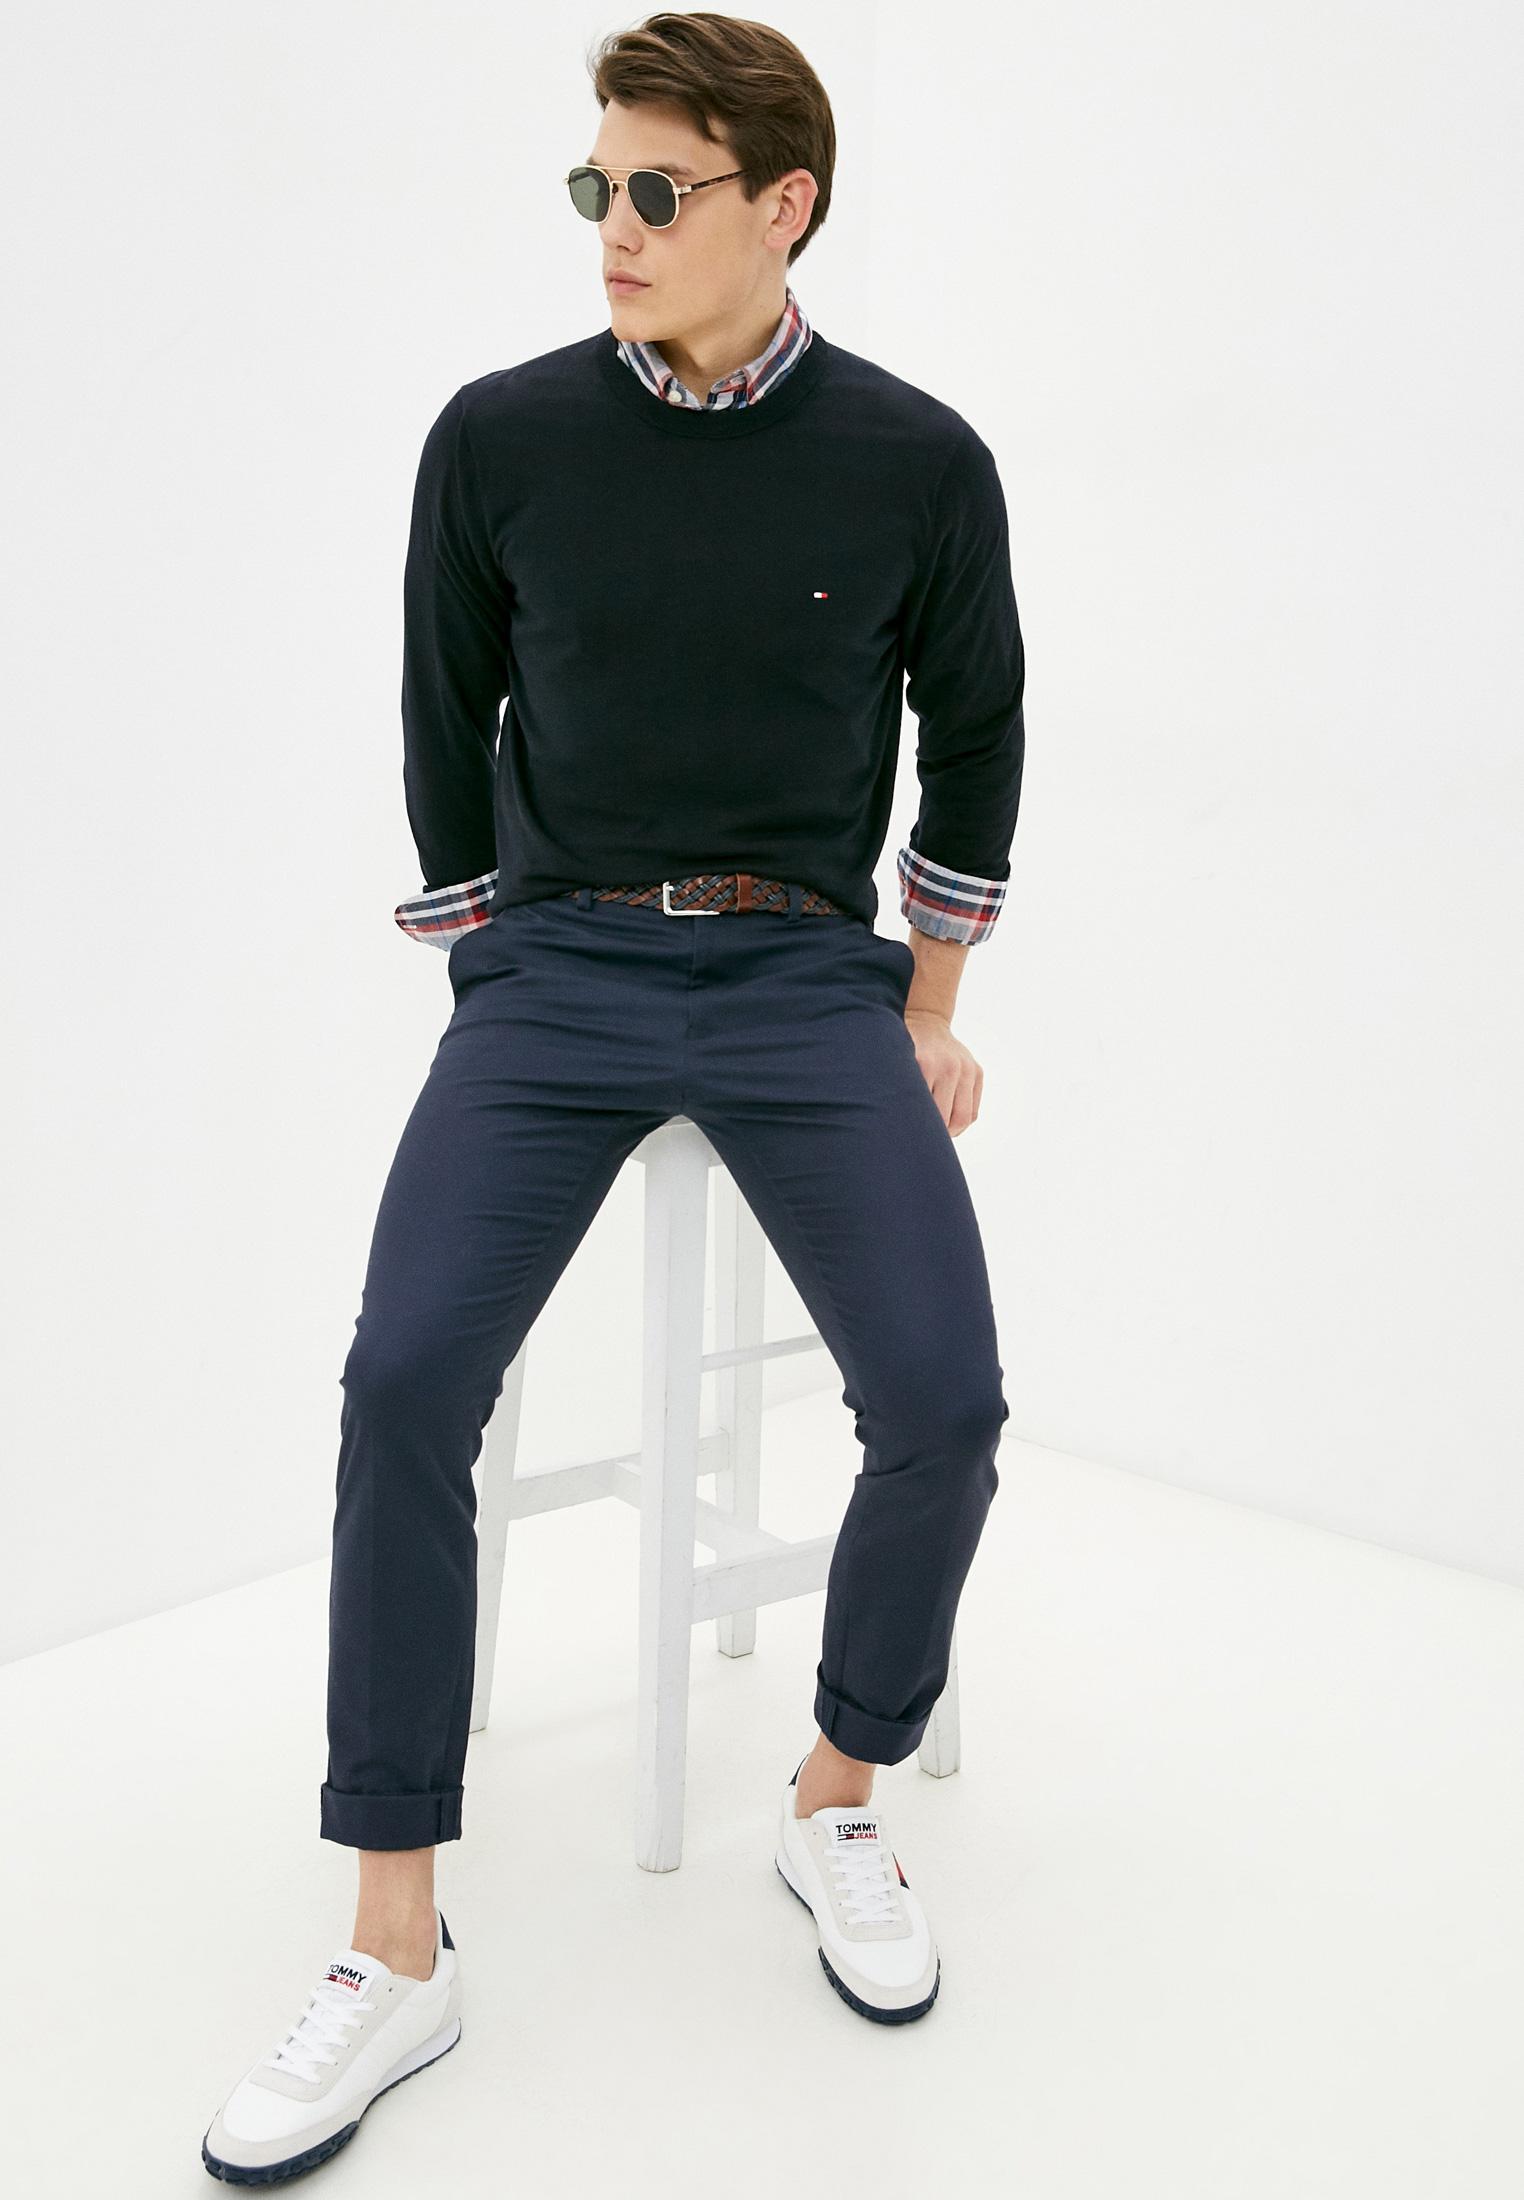 Джемпер Tommy Hilfiger (Томми Хилфигер) MW0MW17352: изображение 2